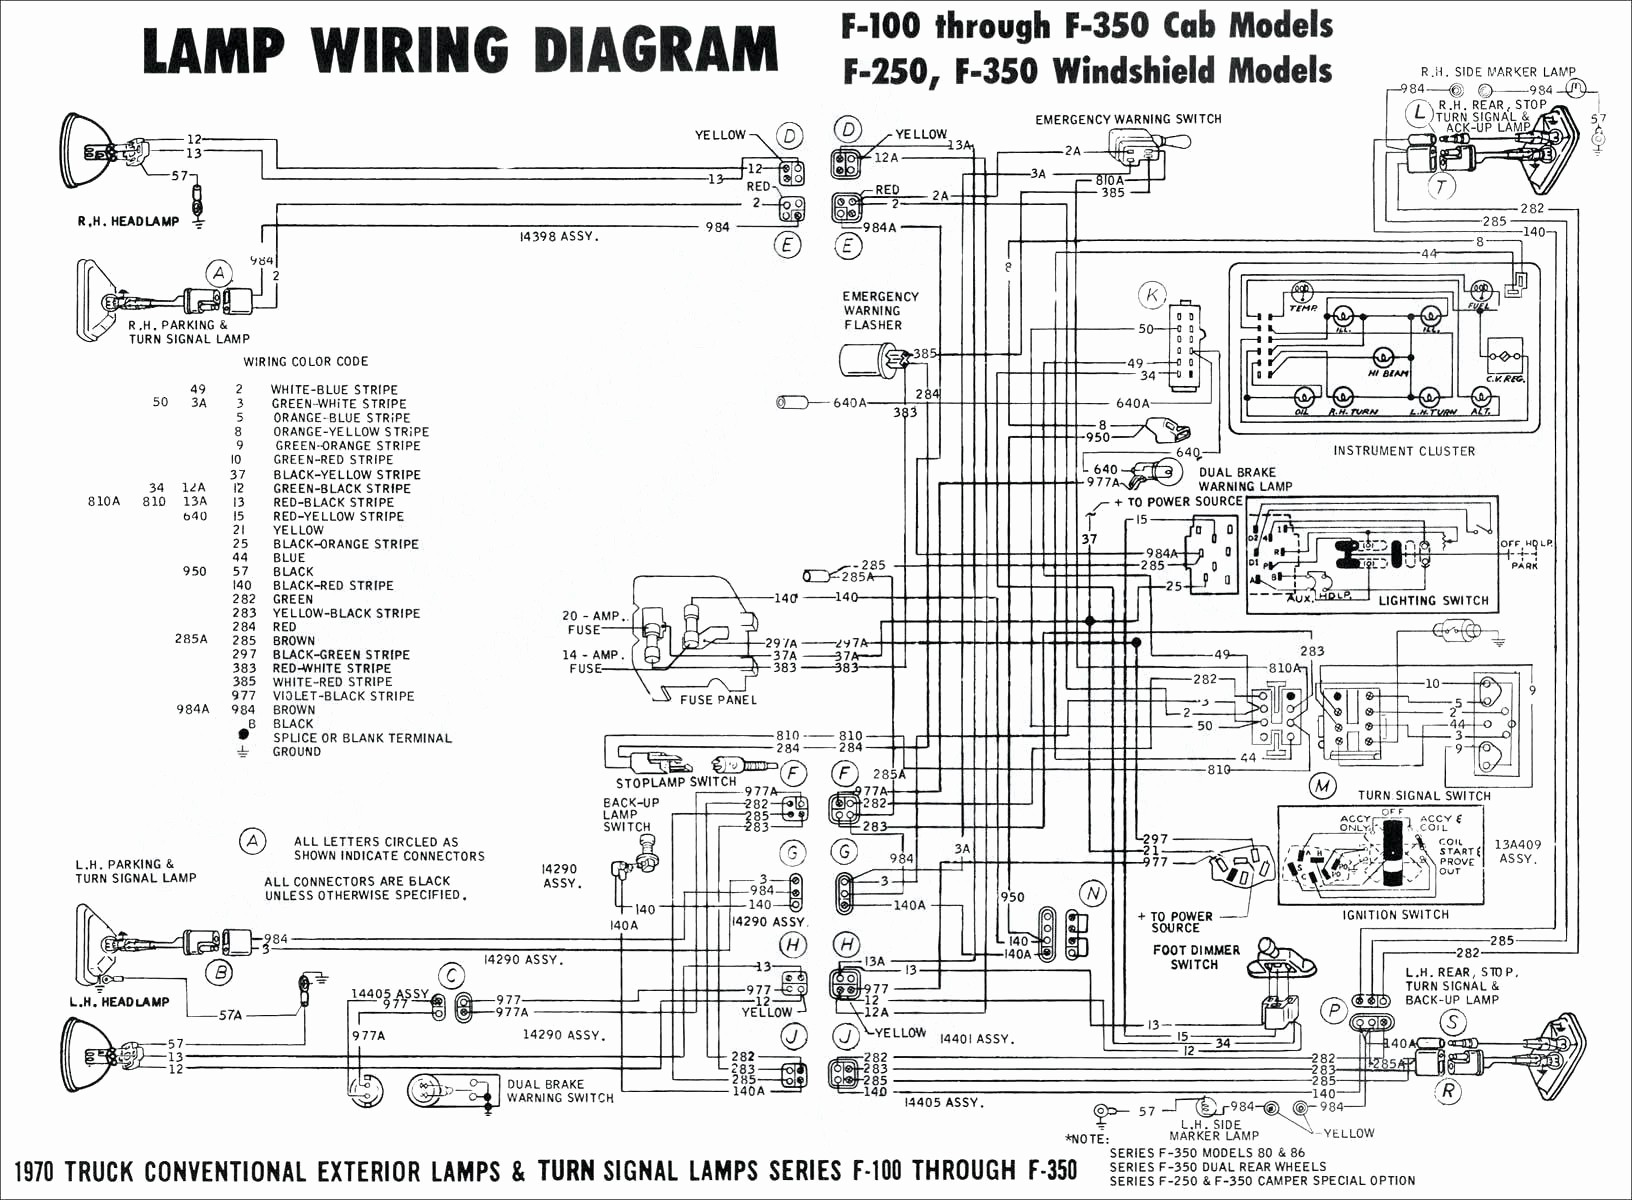 2007 silverado trailer wiring harness